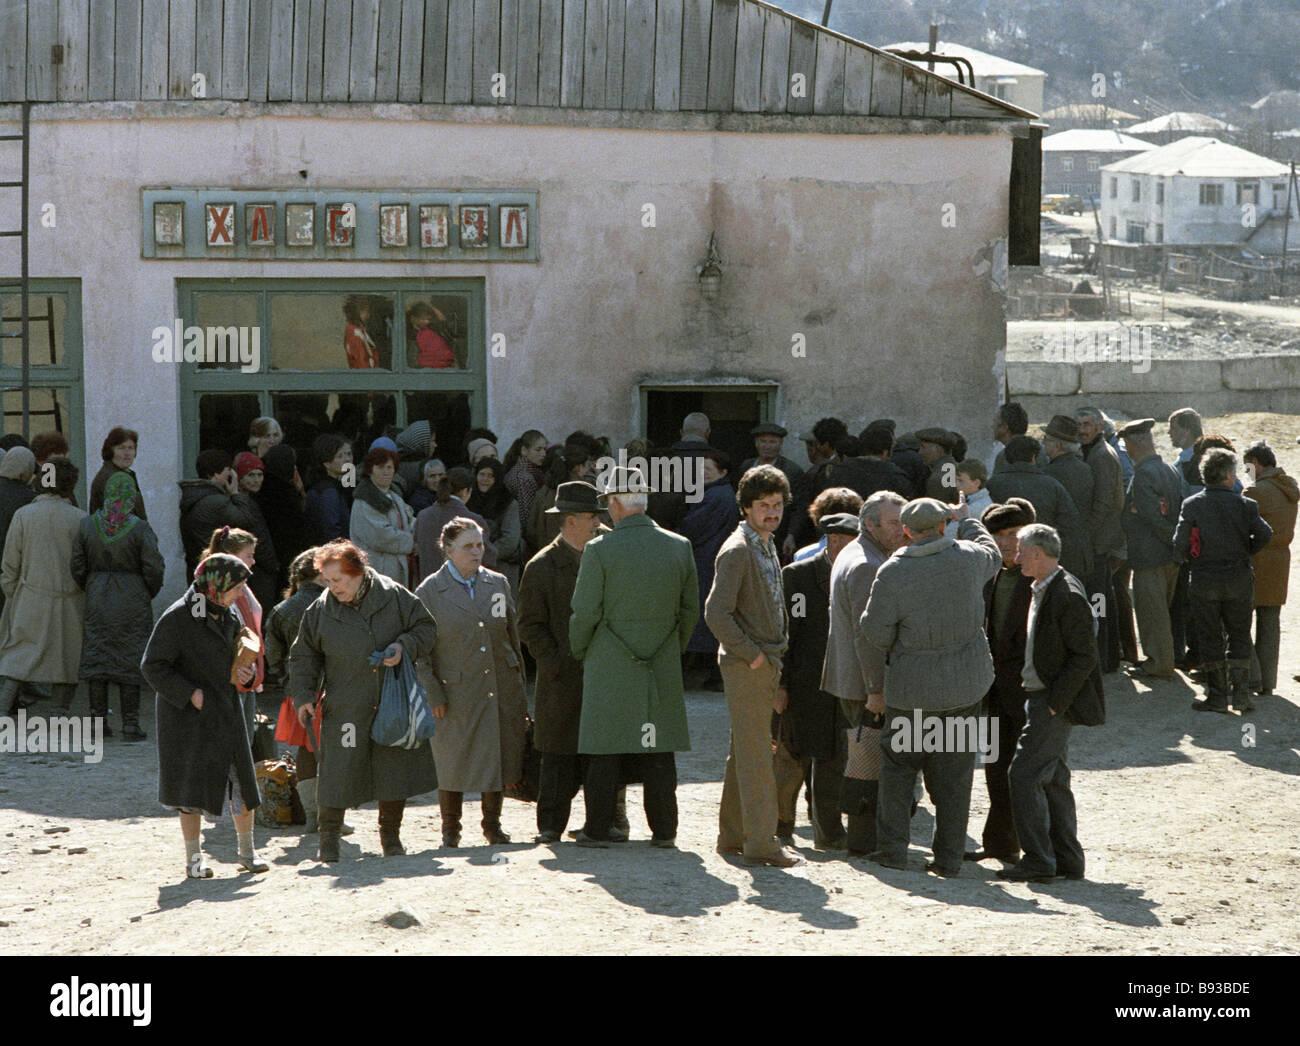 Tskhinvali residents waiting for food near shop - Stock Image